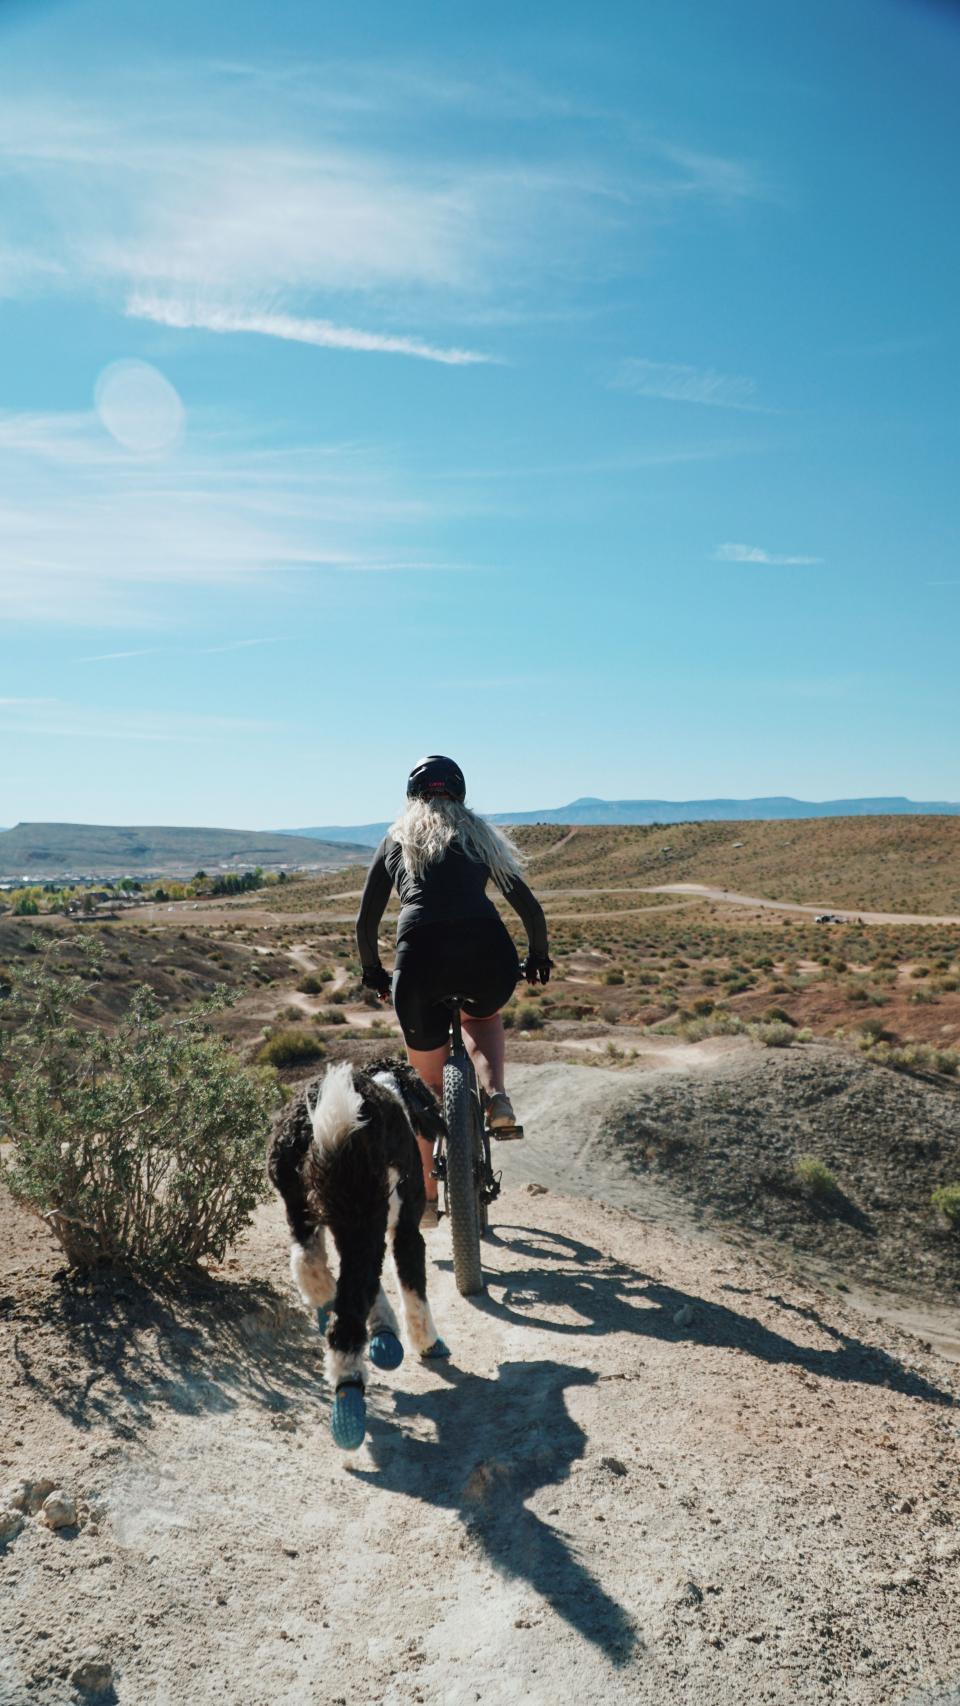 mountain, blue, sky, bike, adventure, outdoor, travel, sunny, day, sport, fitness, exercise, dog, animal, running, highland